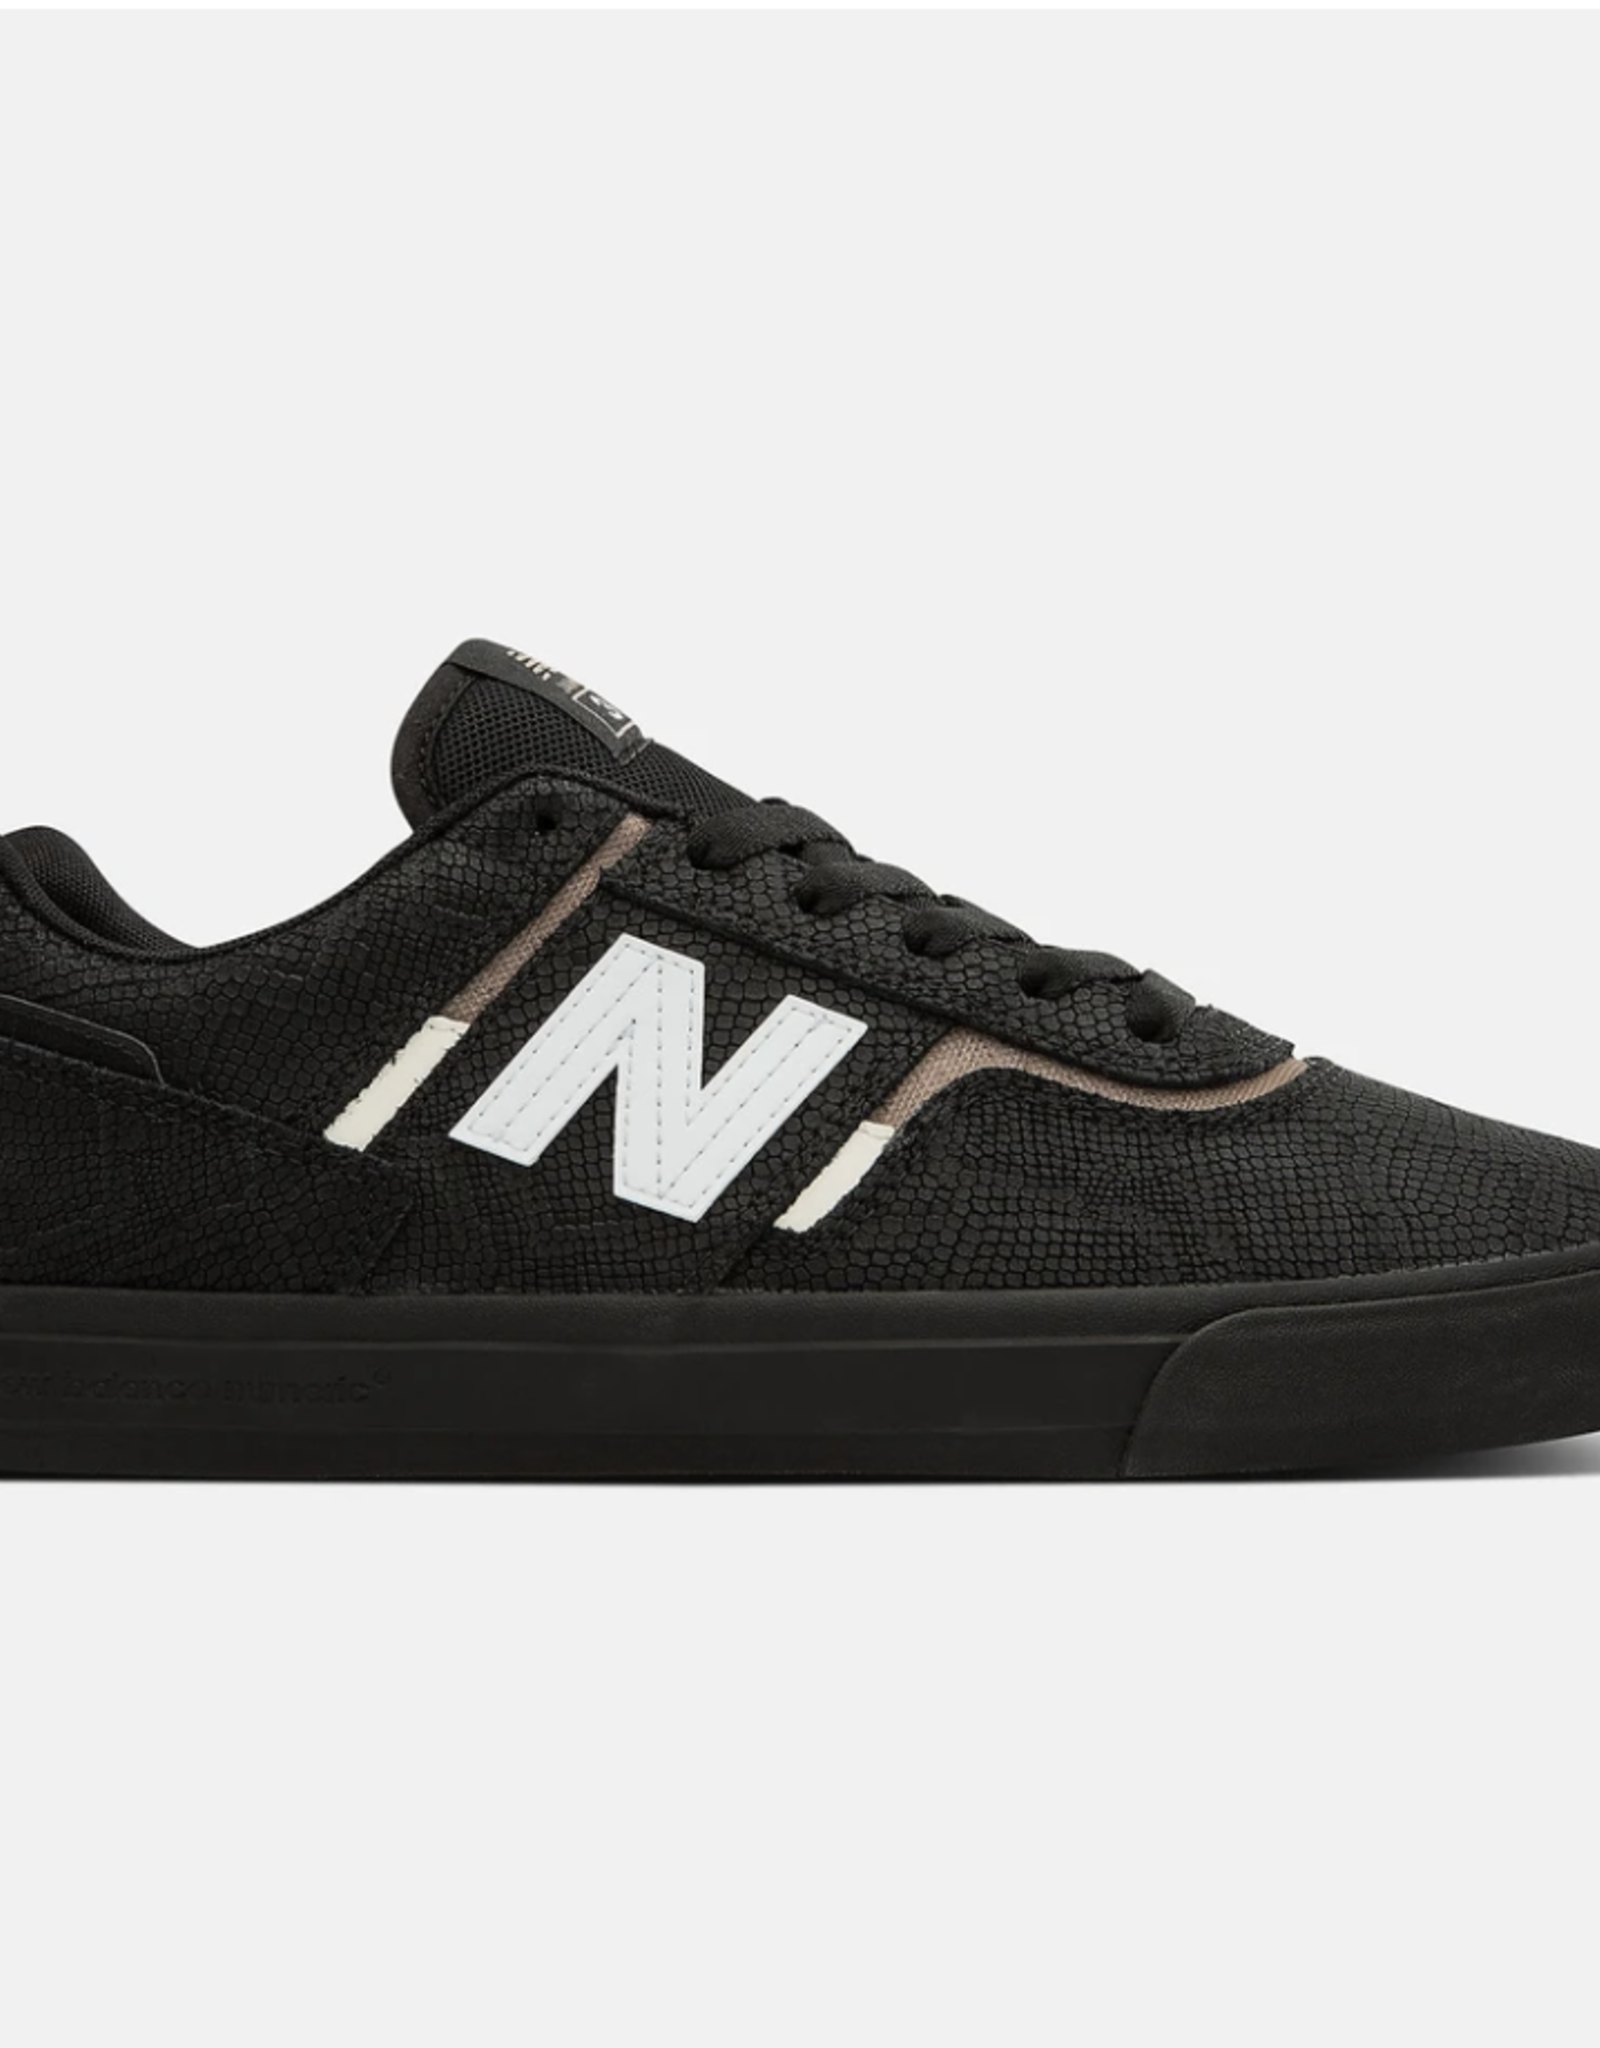 New Balance NB Numeric 306 Black/Black